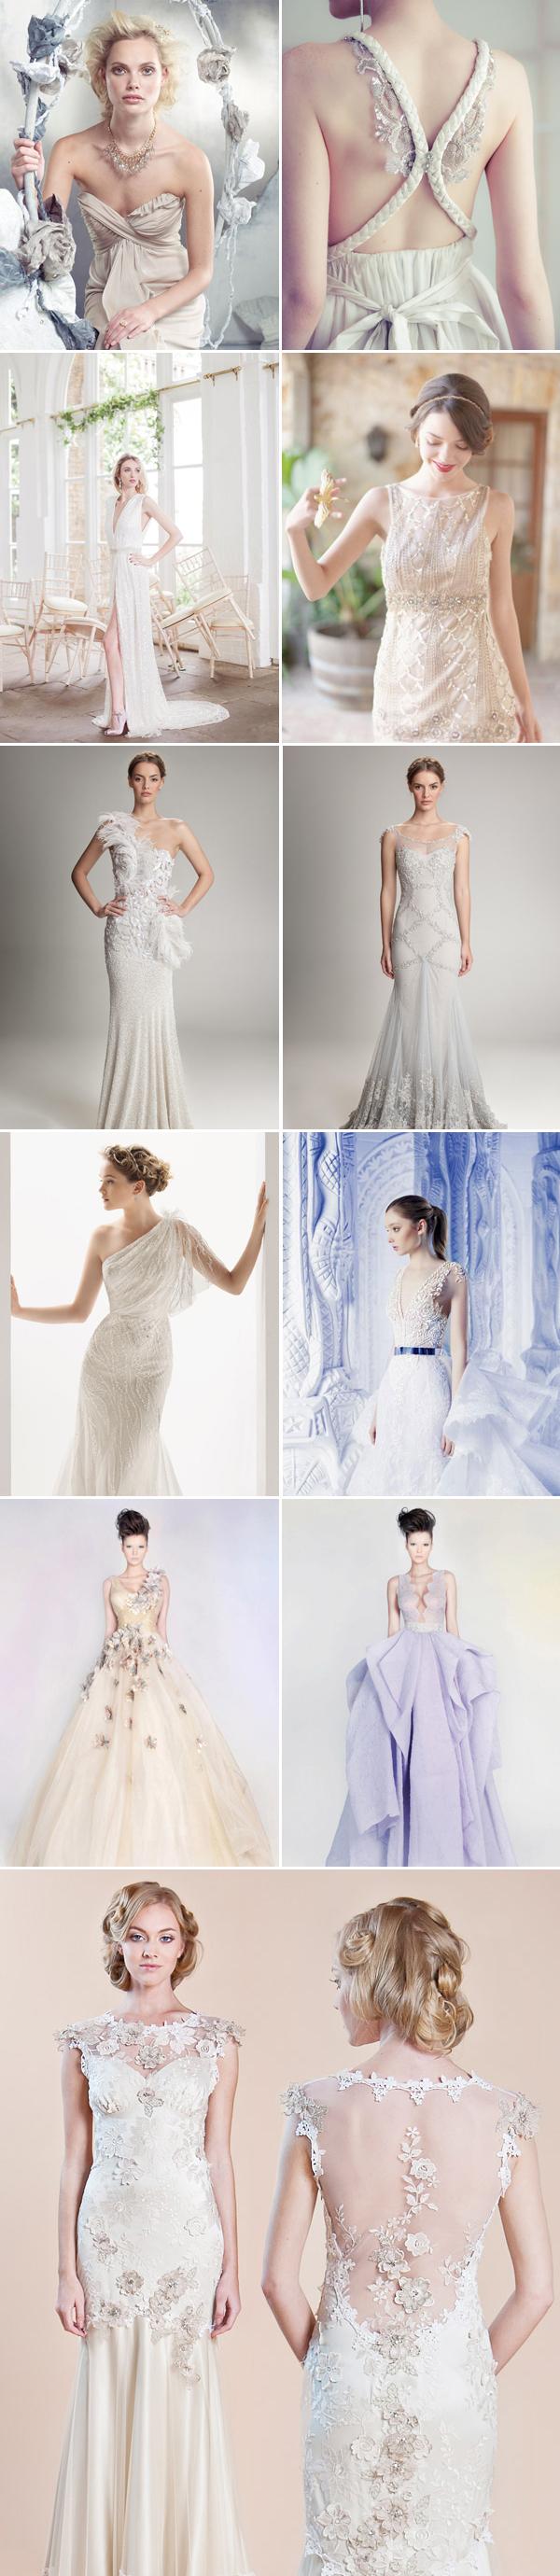 elegant reception gowns